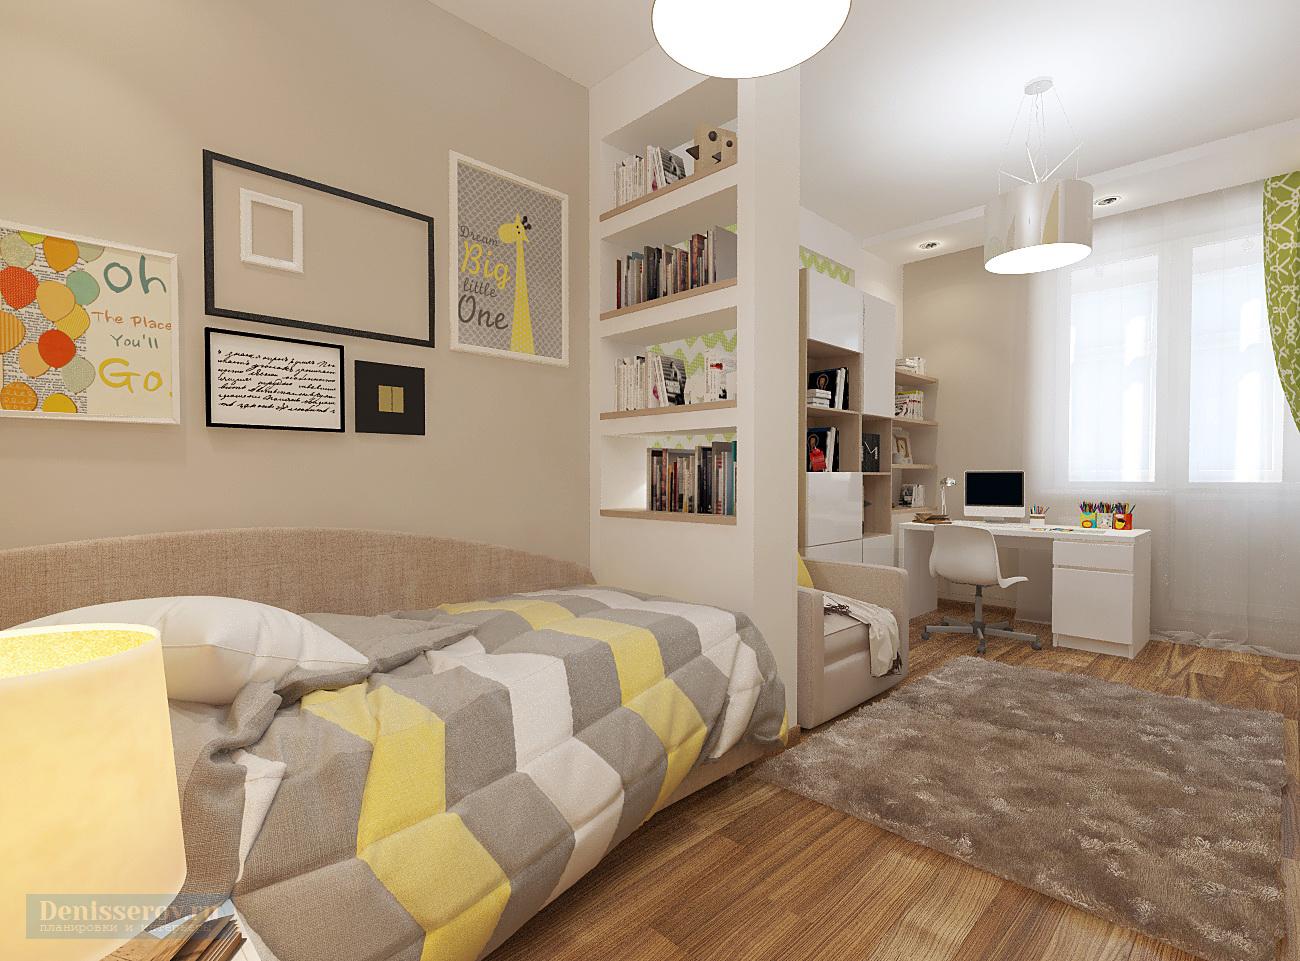 Комната 20 кв.м дизайн семья с ребенком